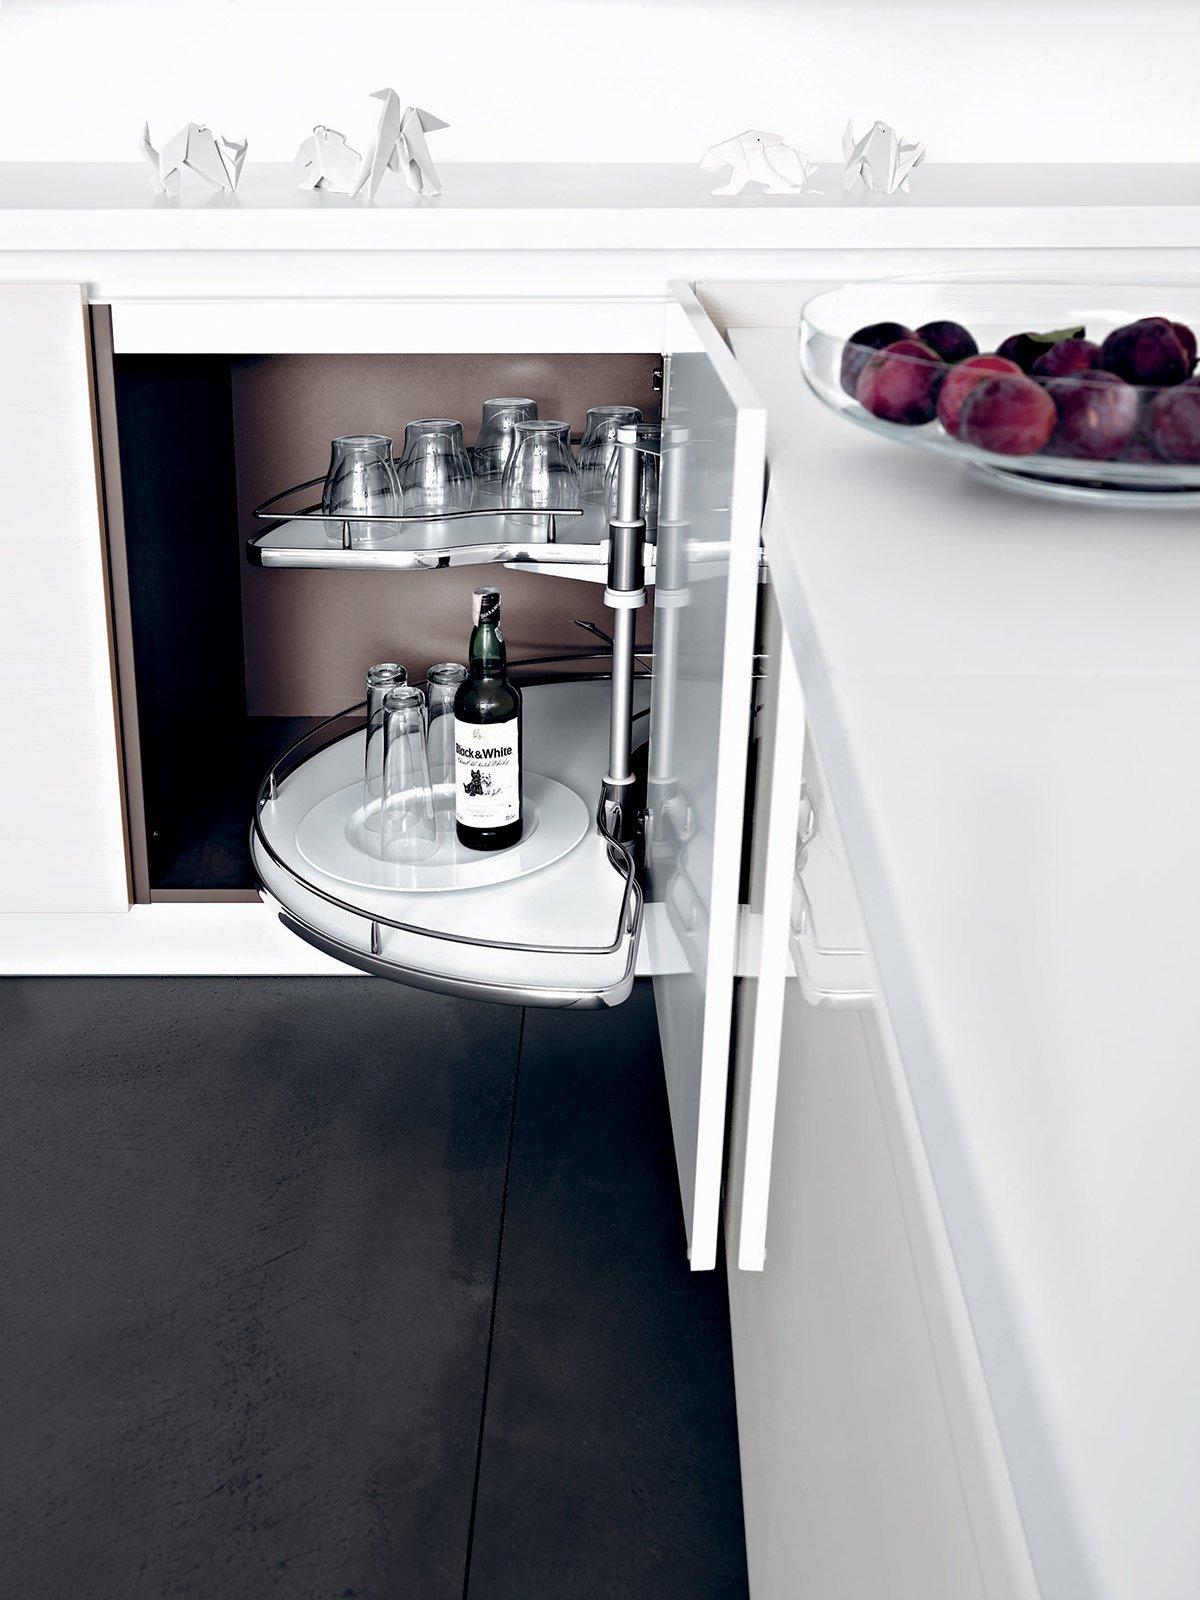 cucina: le soluzioni per l'angolo - cose di casa - Basi Di Cucina